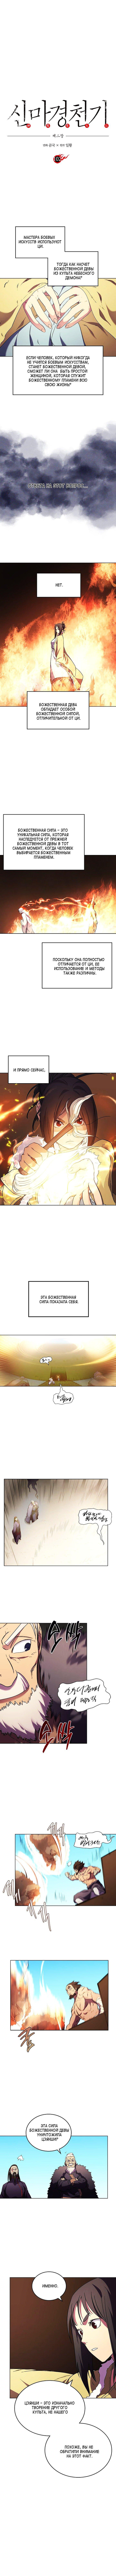 Манга Хроники Святого Демона - Глава 102 Страница 1